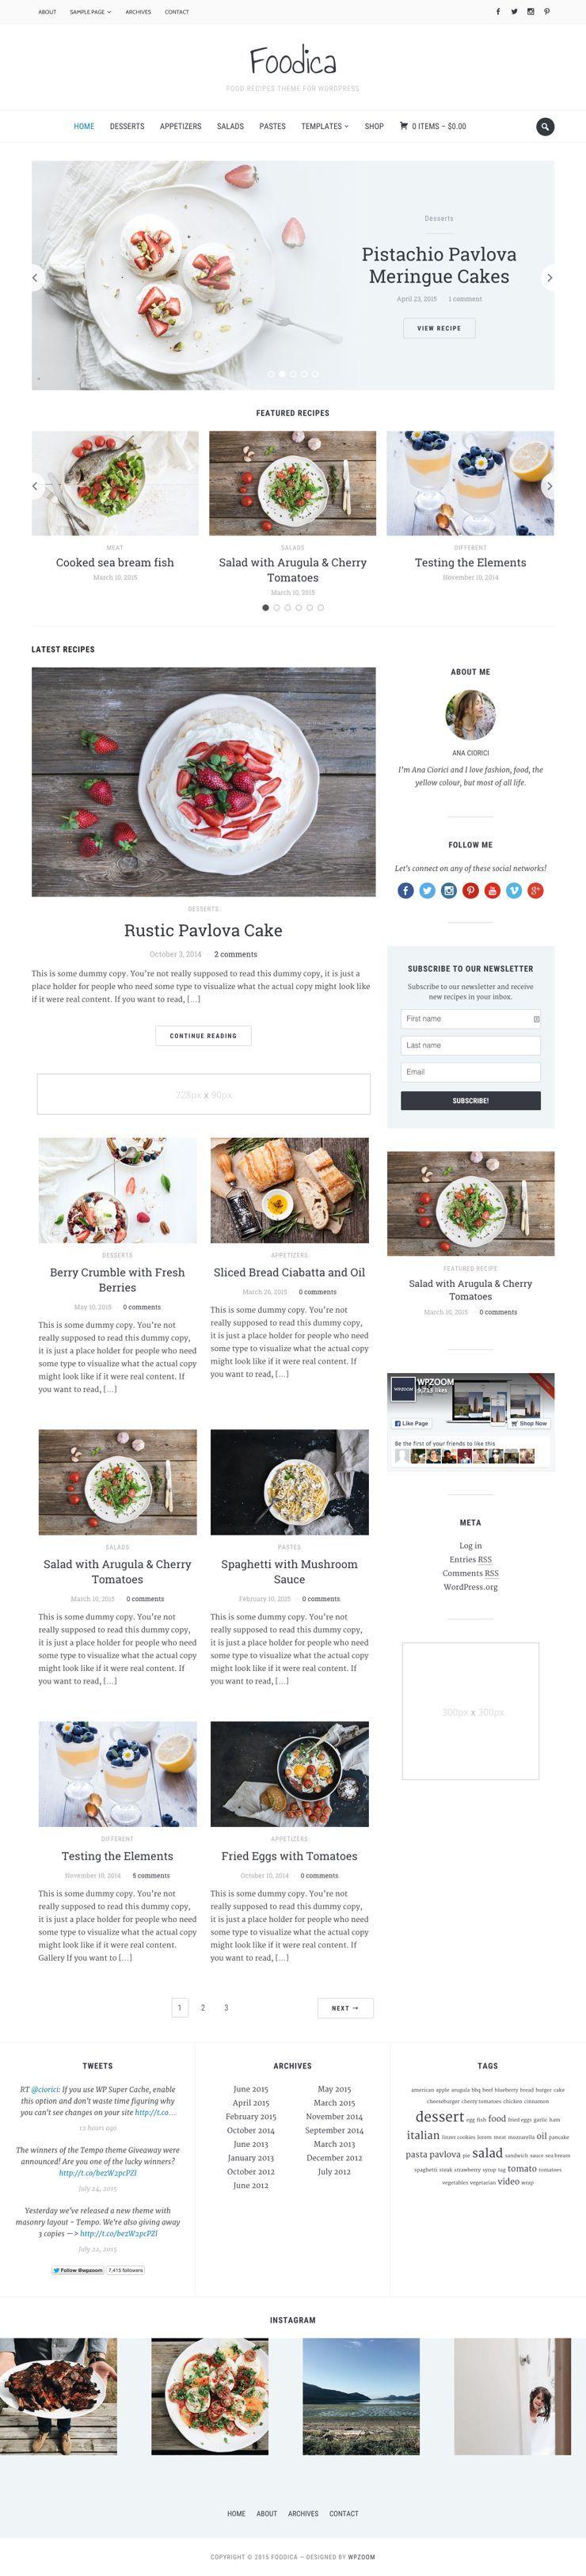 Foodica WordPress Food Recipes Magazine Theme - www.wpchats.com